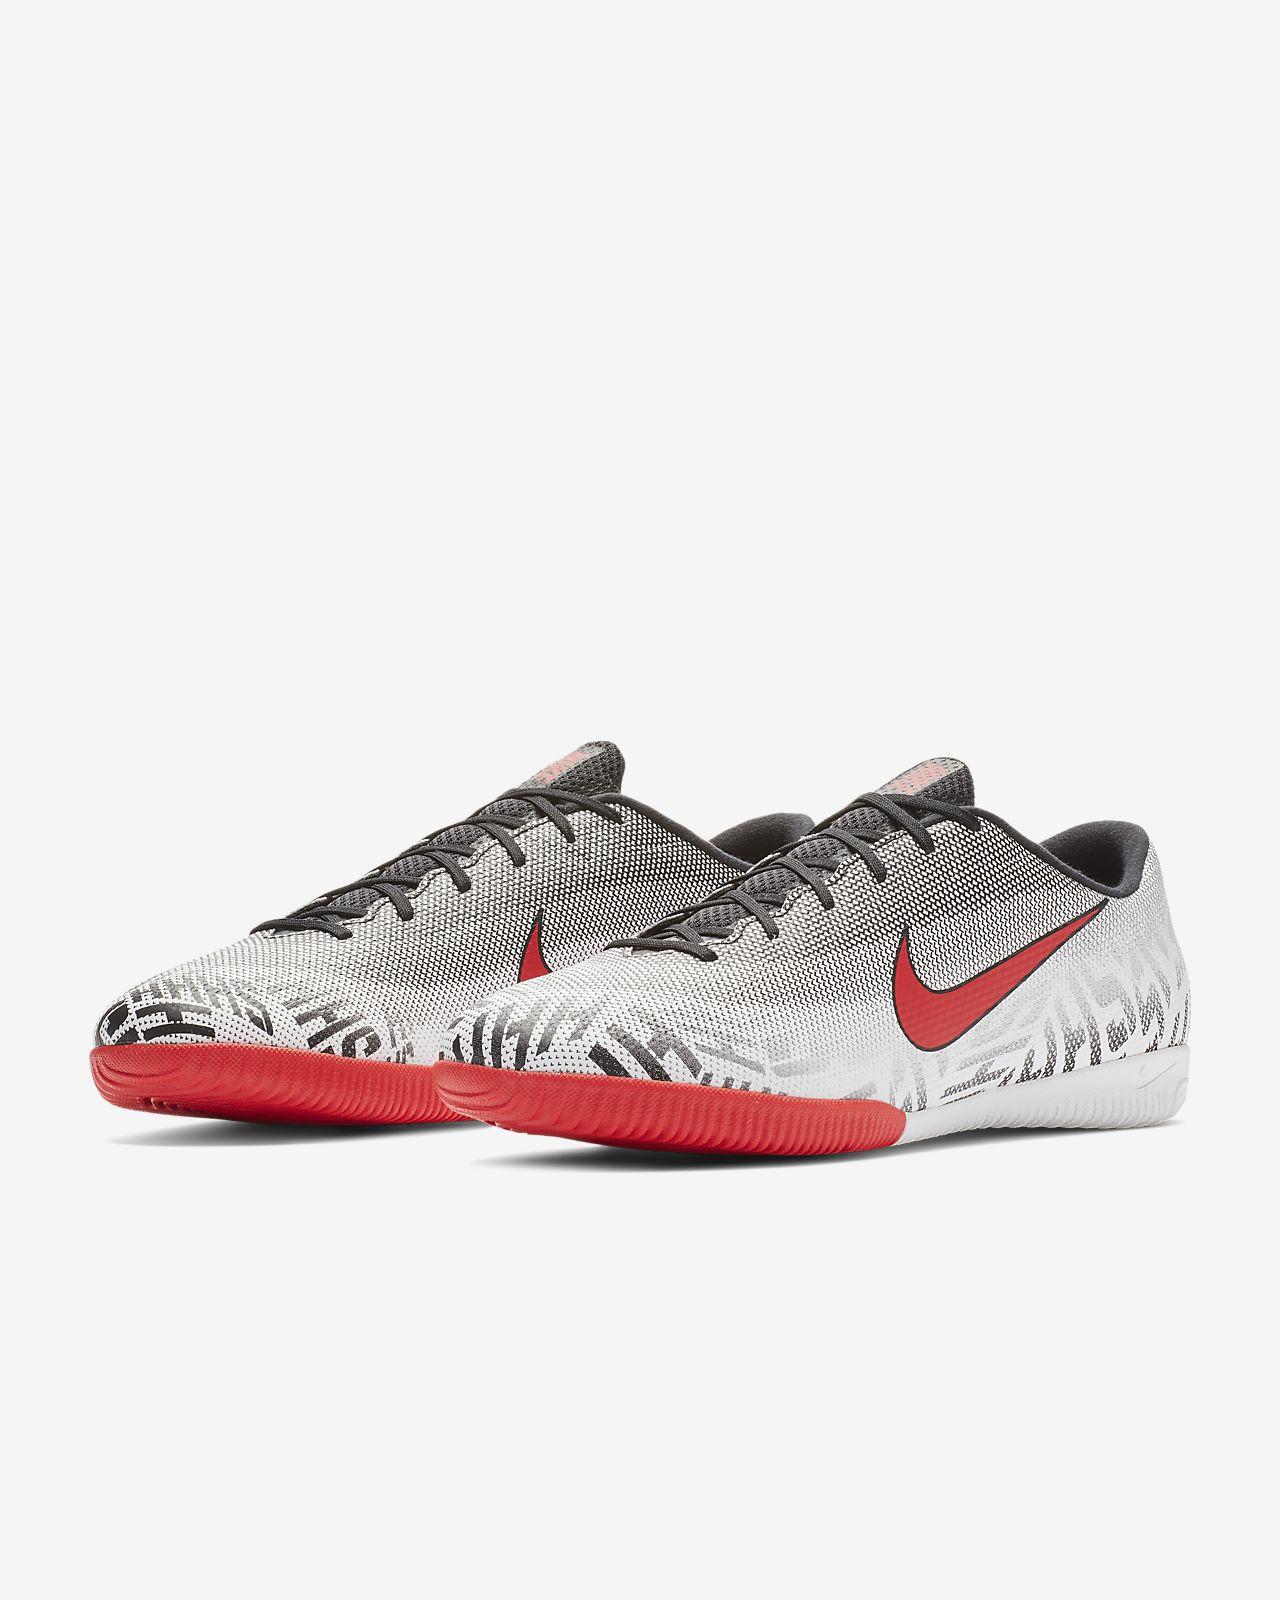 4bbe924f6 ... Nike Mercurial Vapor XII Academy Neymar Jr. Indoor Court Football Shoe